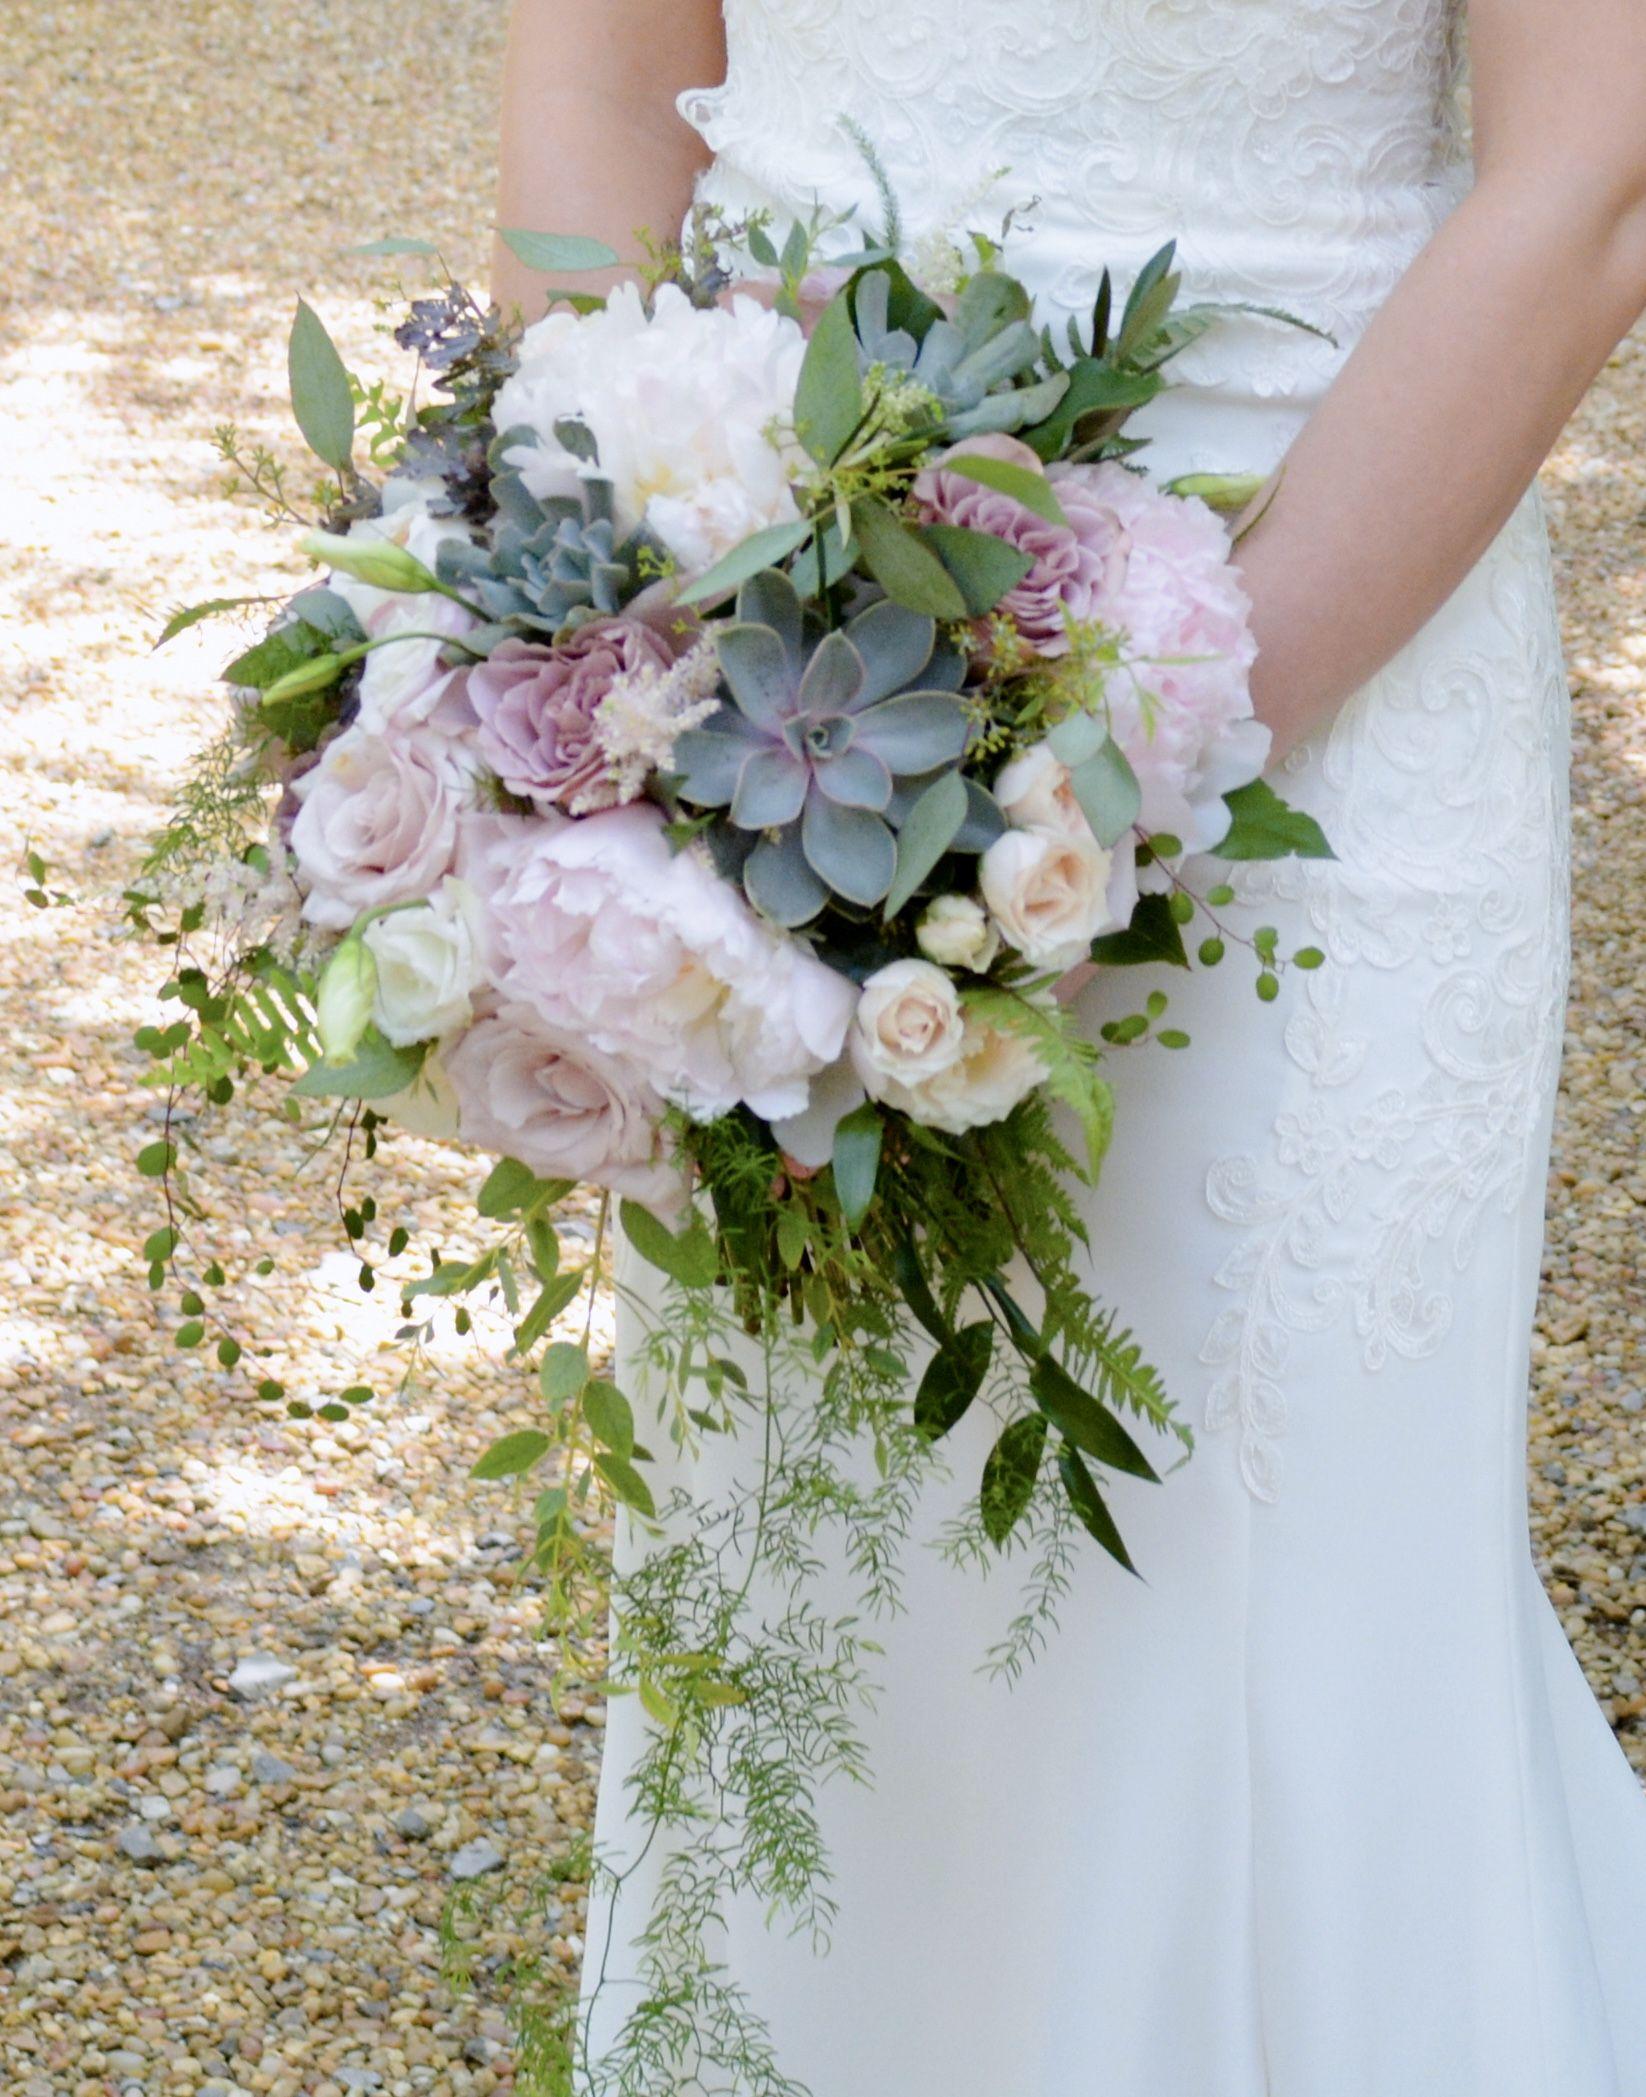 Spring Woodland Chattanooga Wedding with Peony and